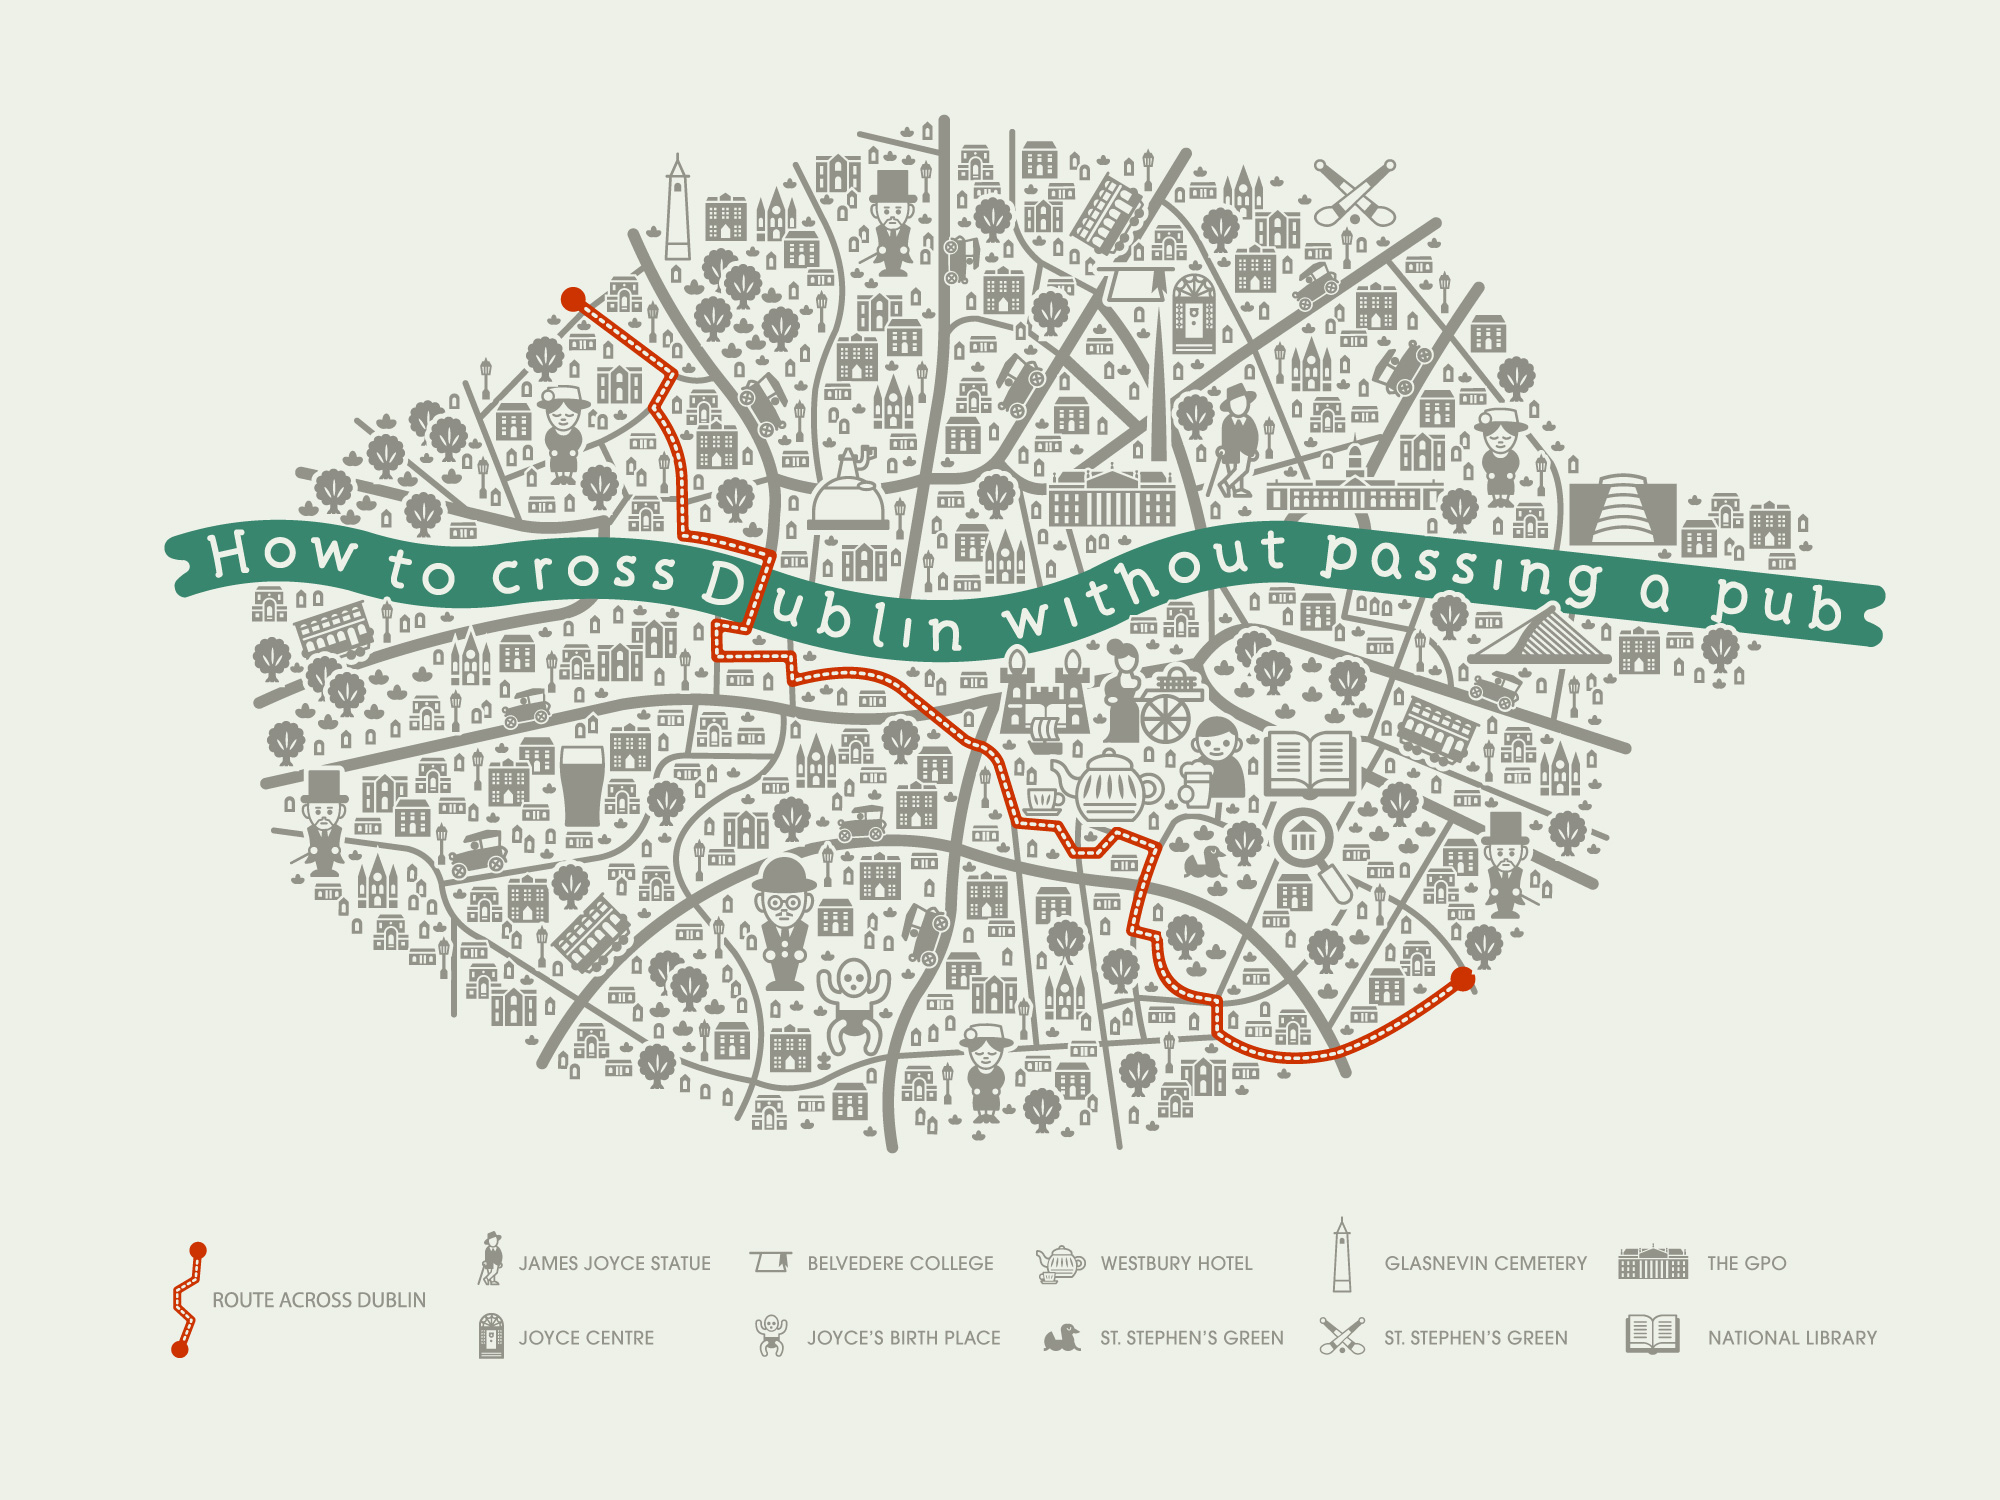 kallwijts map from nuala husseys blog post